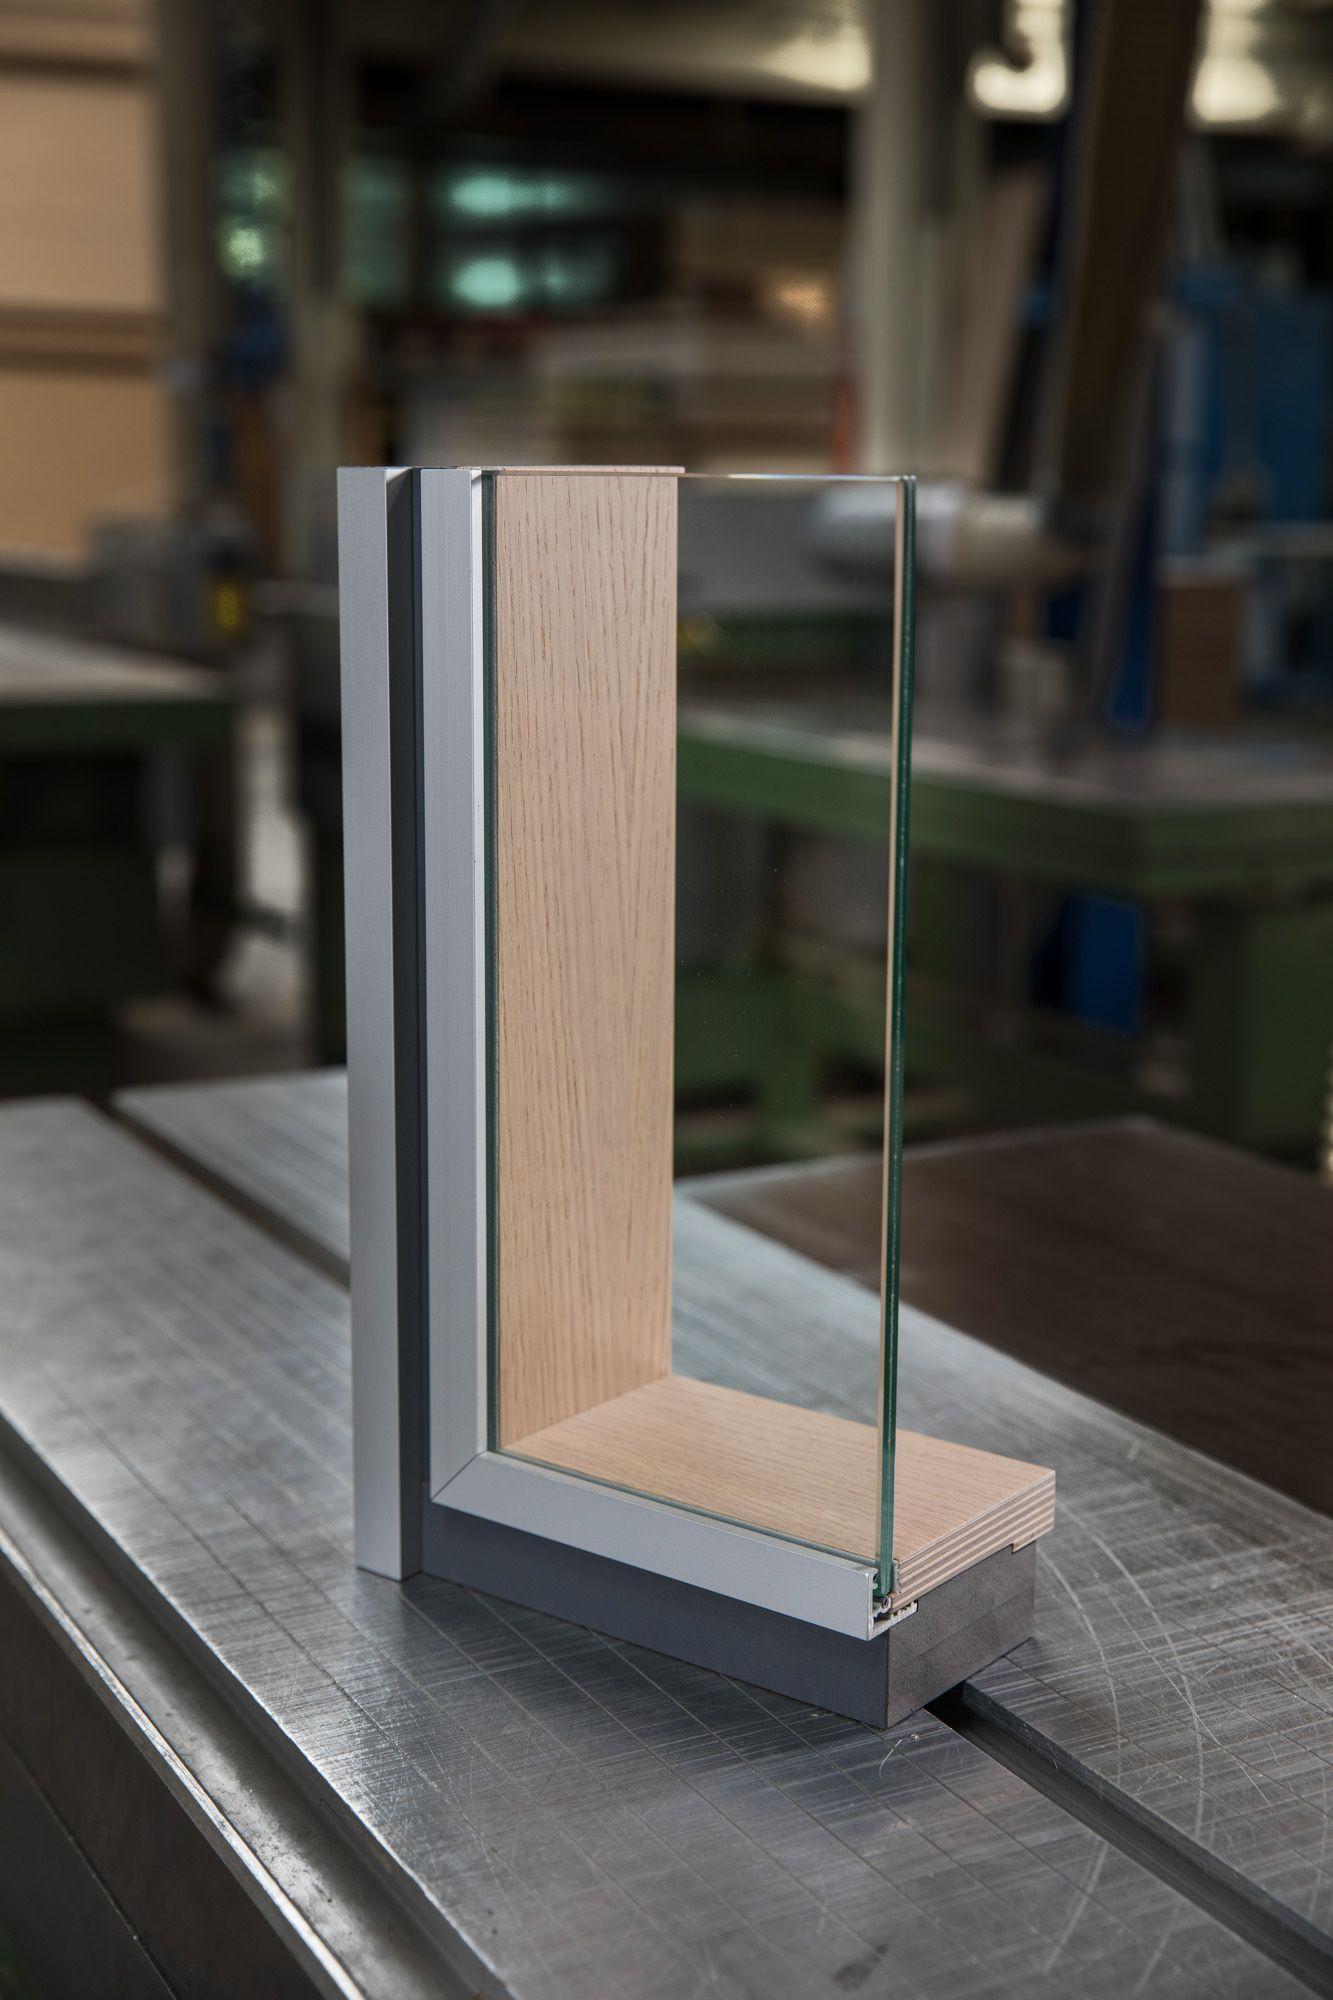 Handmuster Ts1 Gl Trennwand Glasscheiben Raumaufteilung